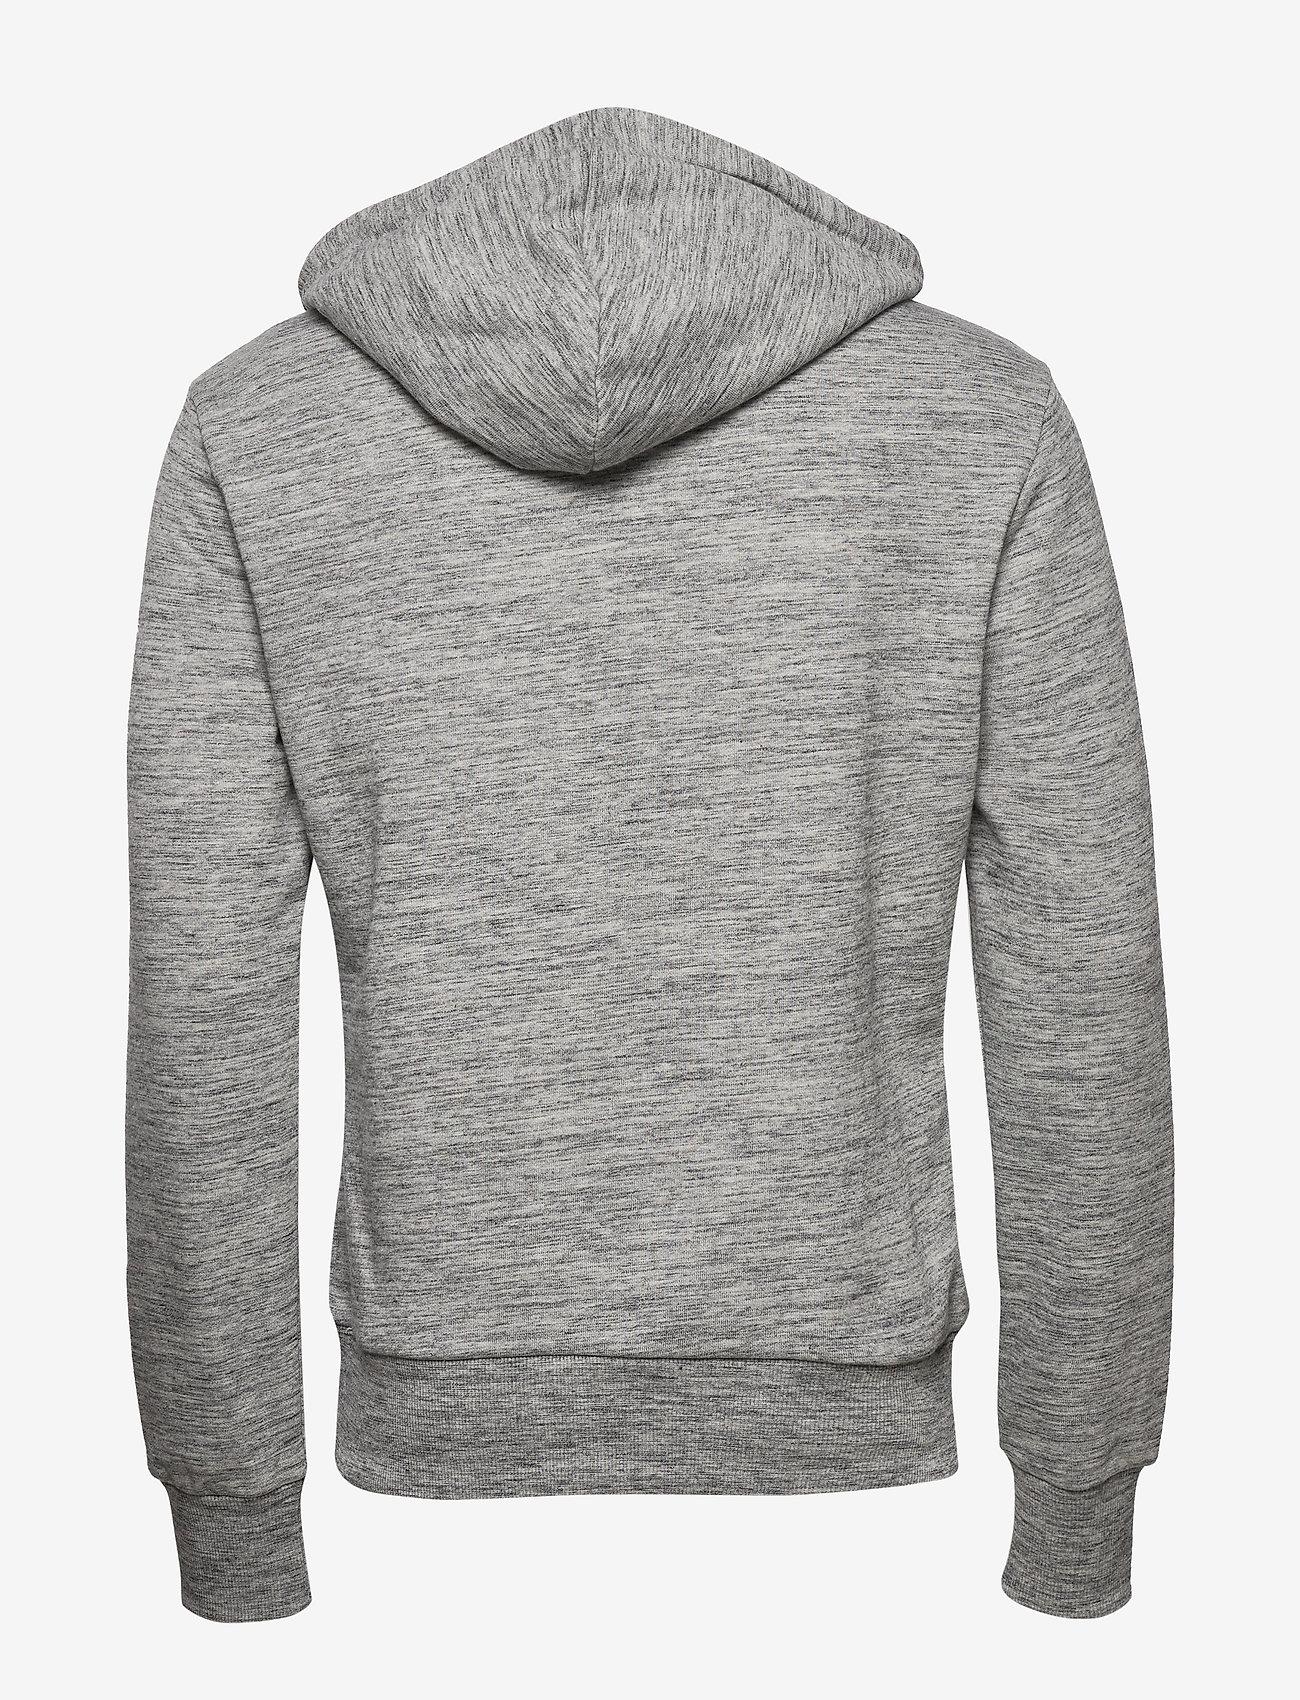 Superdry Vl Pasteline Hood - Sweatshirts CARBON GREY SPACE DYE - Menn Klær